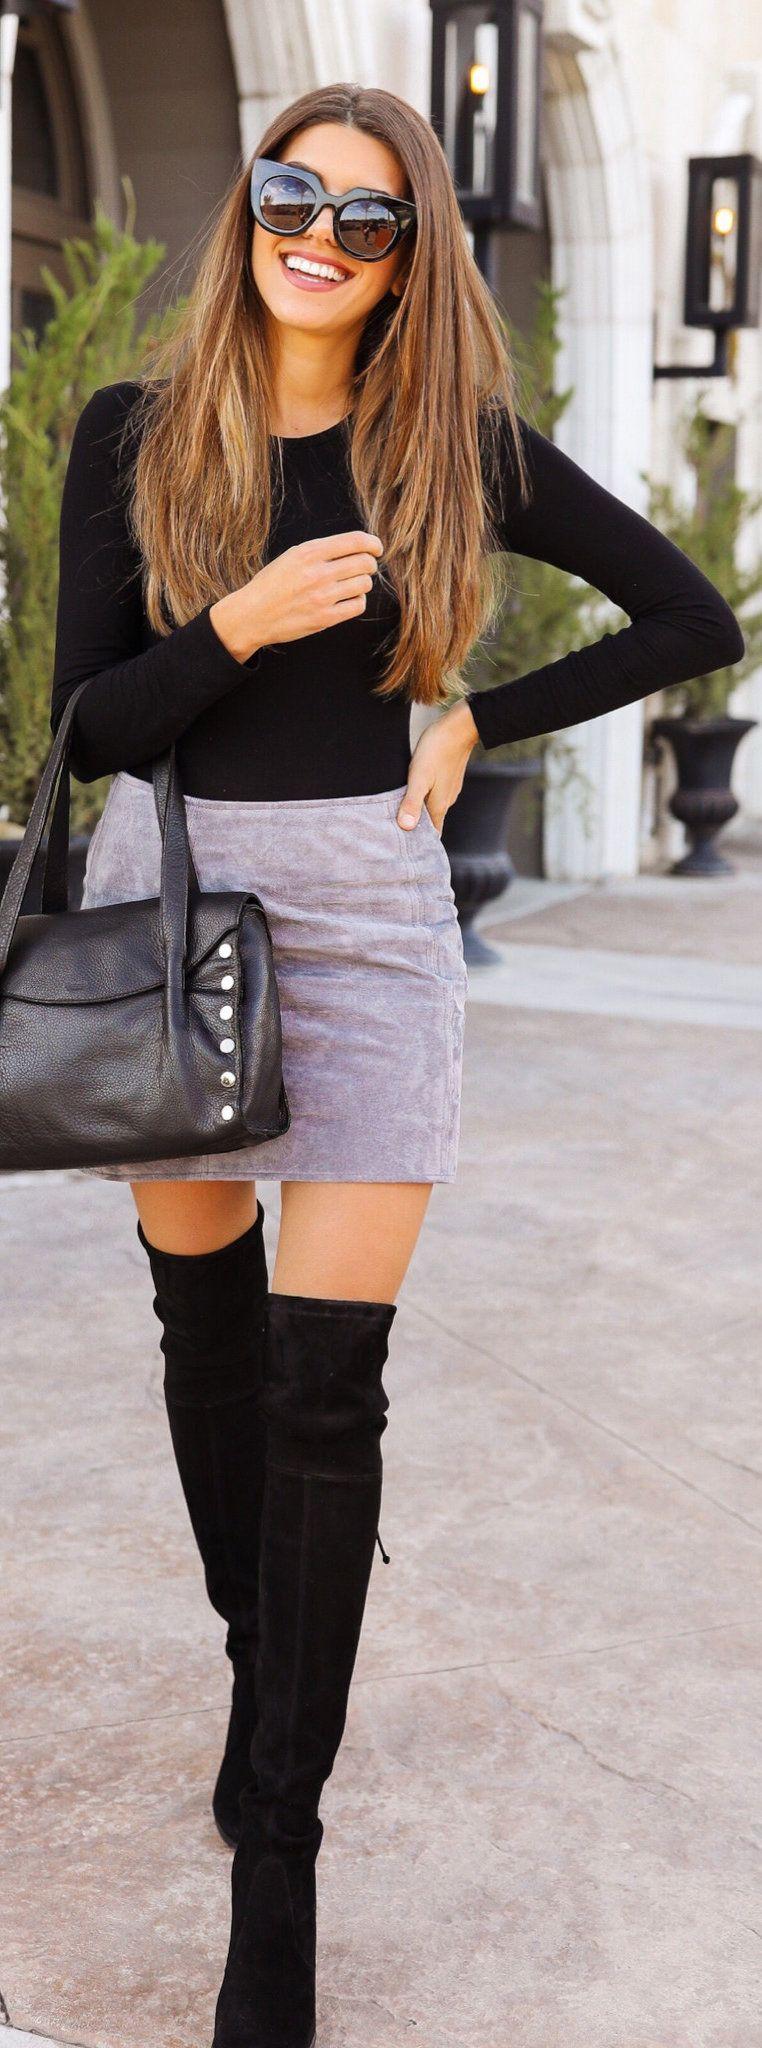 black crew-neck long-sleeved shirt and gray miniskirt